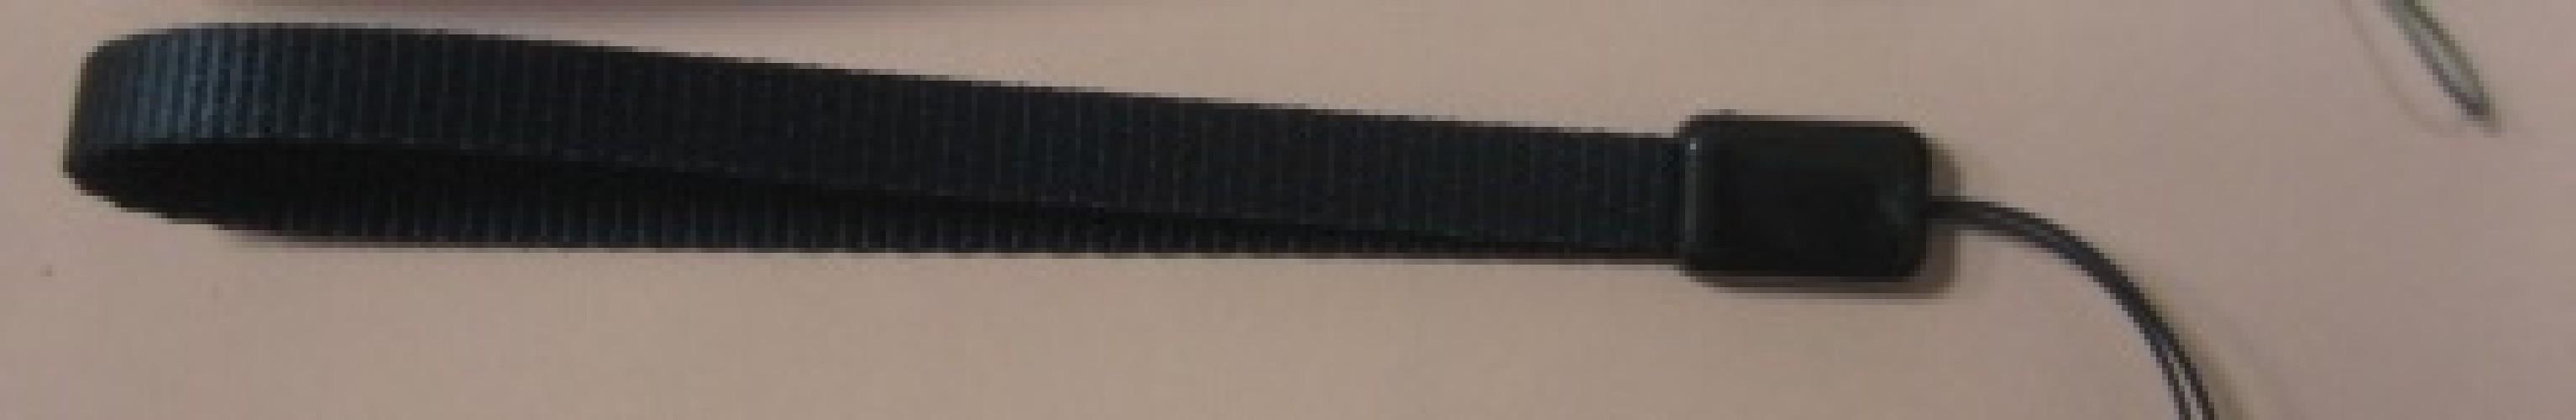 Шнурок на руку ткань черный